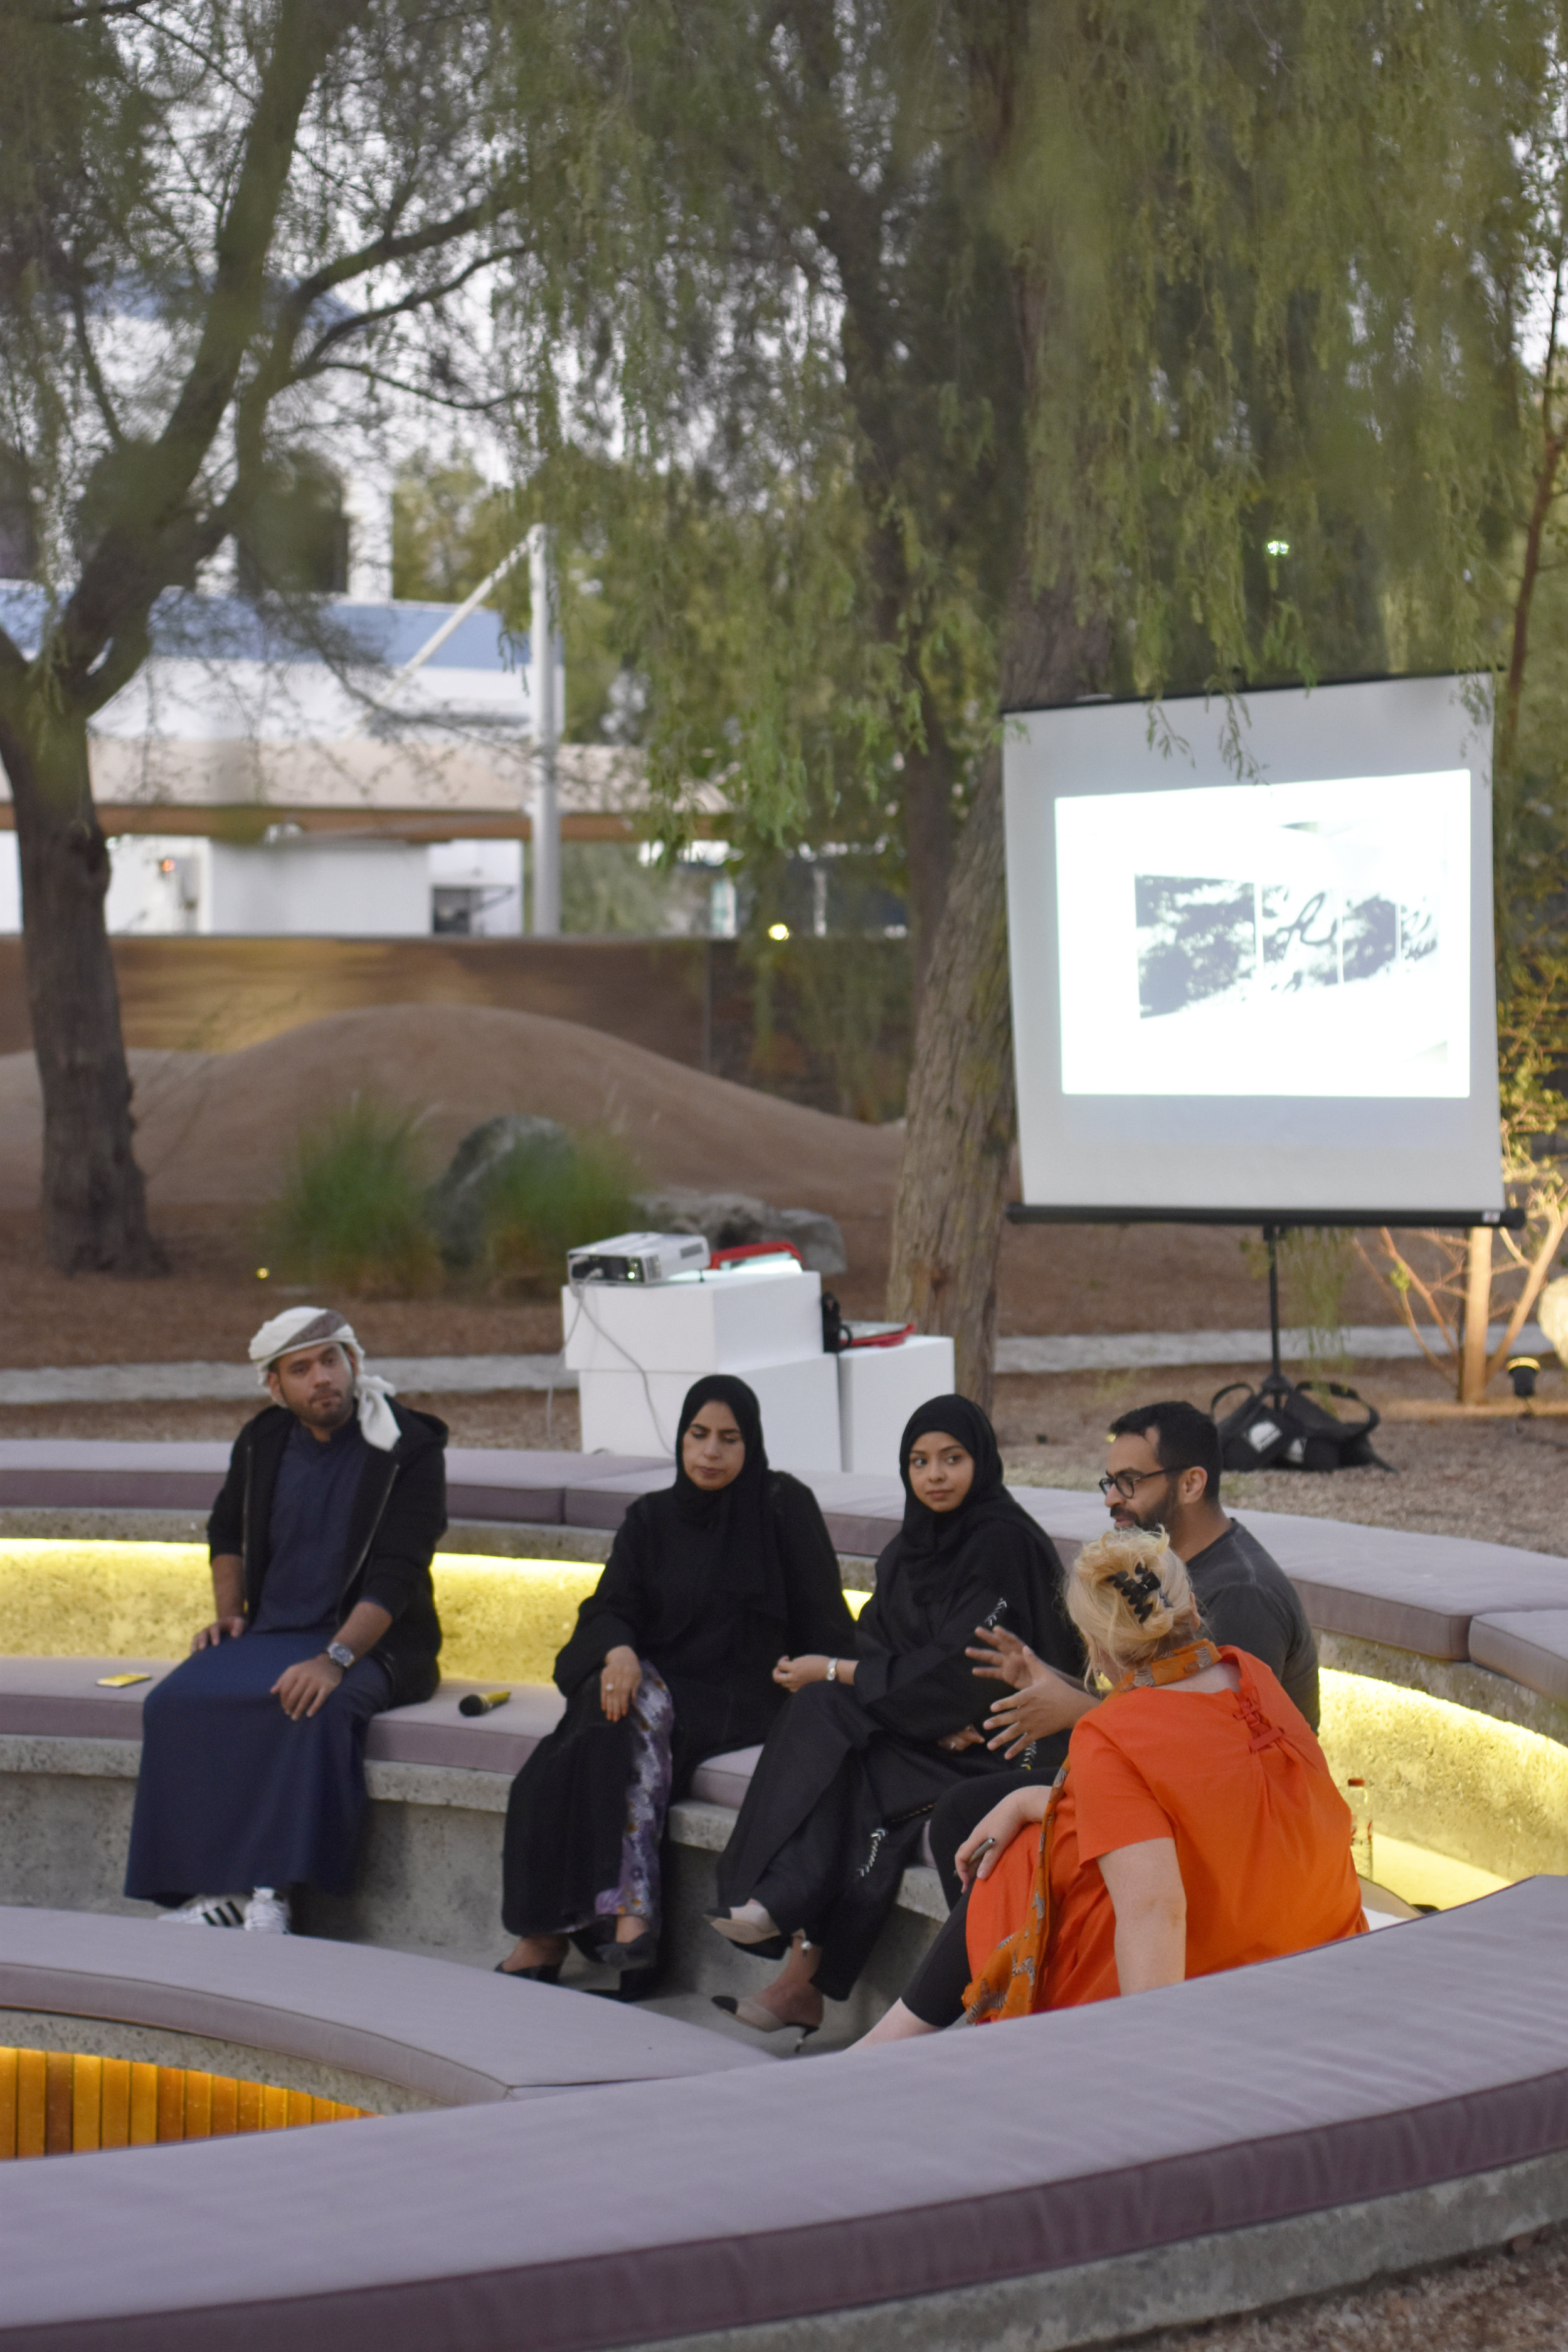 Tashkeel Talk with Saeed Al Madani, Dr. Karima Al Shomaly, Salama Nasib and Khalid Mezaina. Image courtesy of Tashkeel 6.jpg